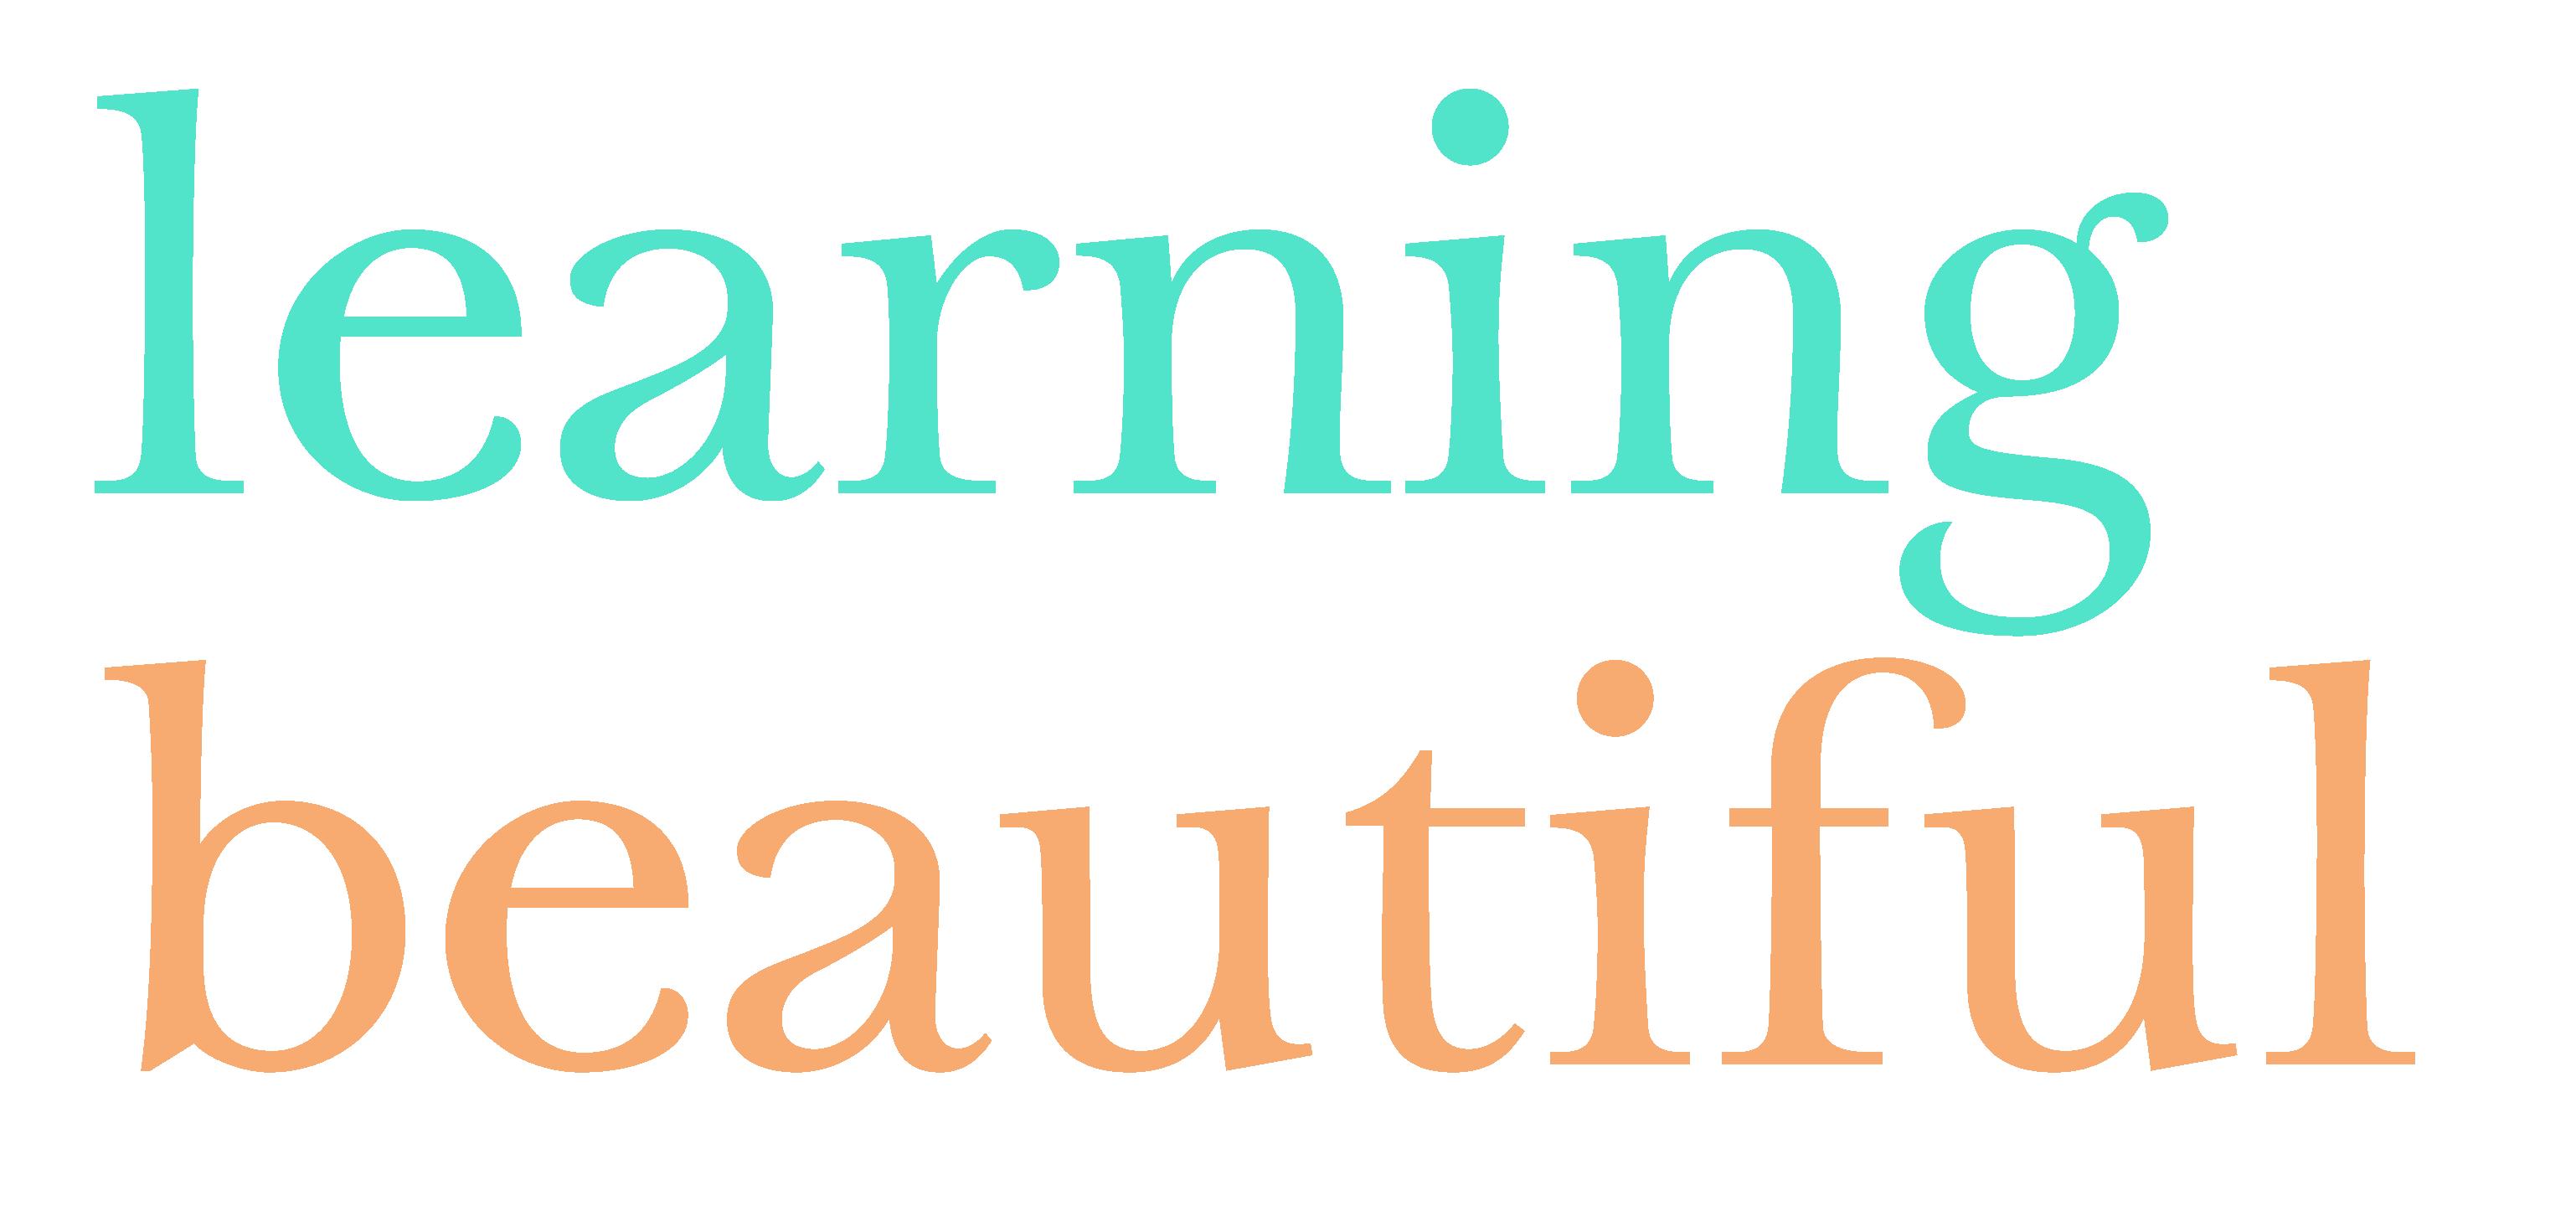 LEARNING BEAUTIFUL